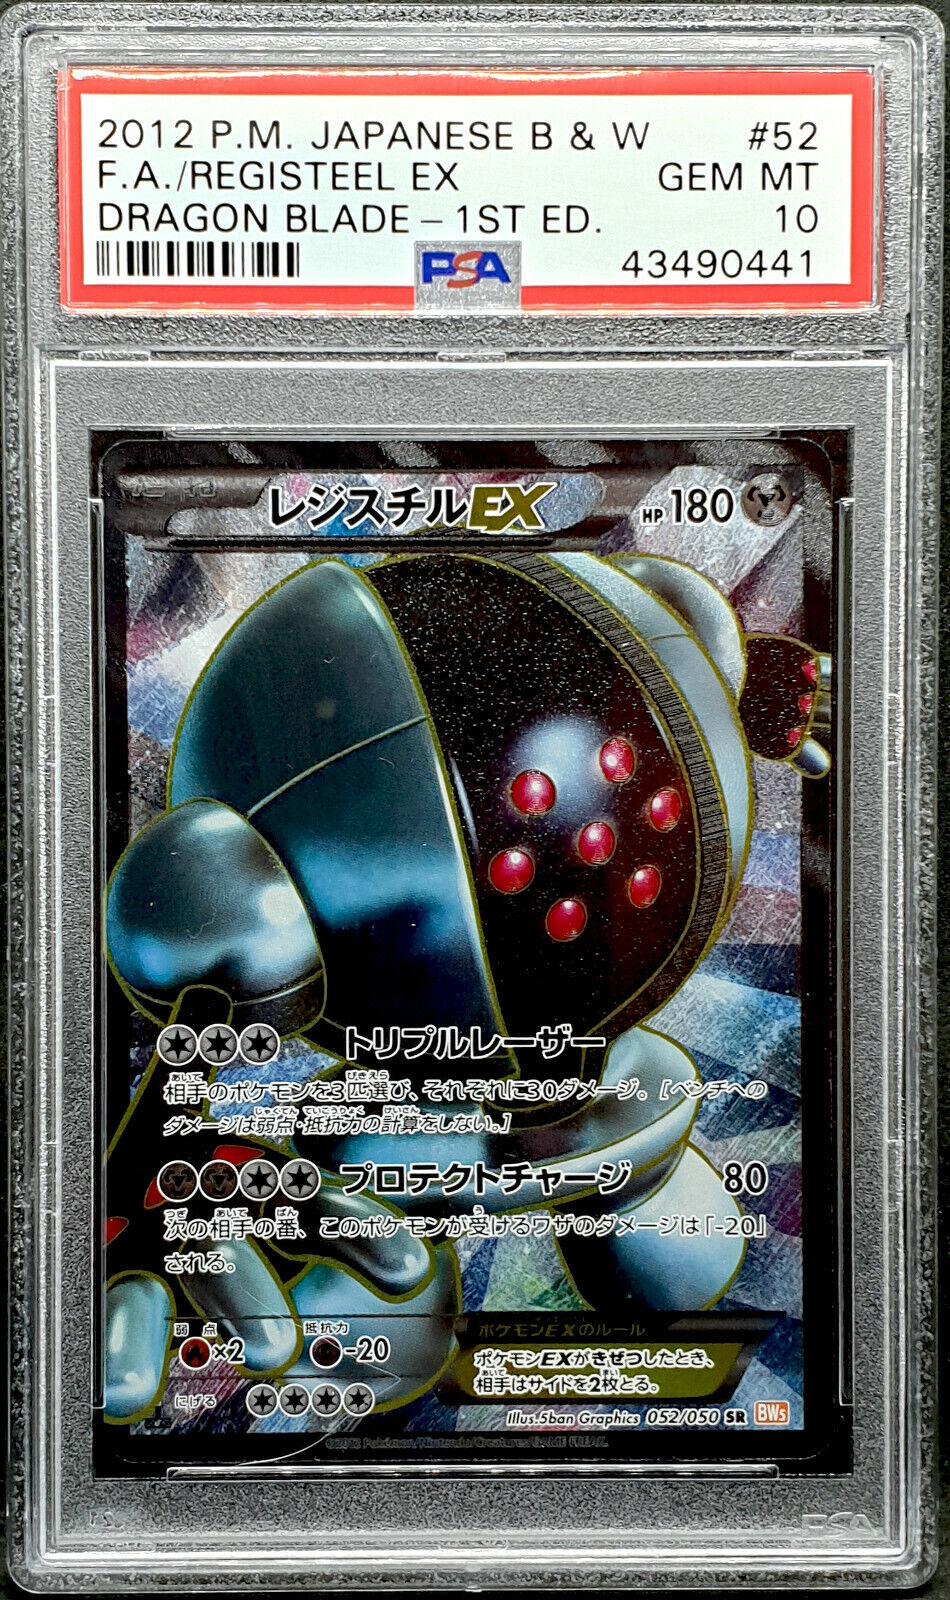 Registeel EX 052 050 Holo 1st Japanese Dragons Exalted Dragon Blade SR - PSA 10